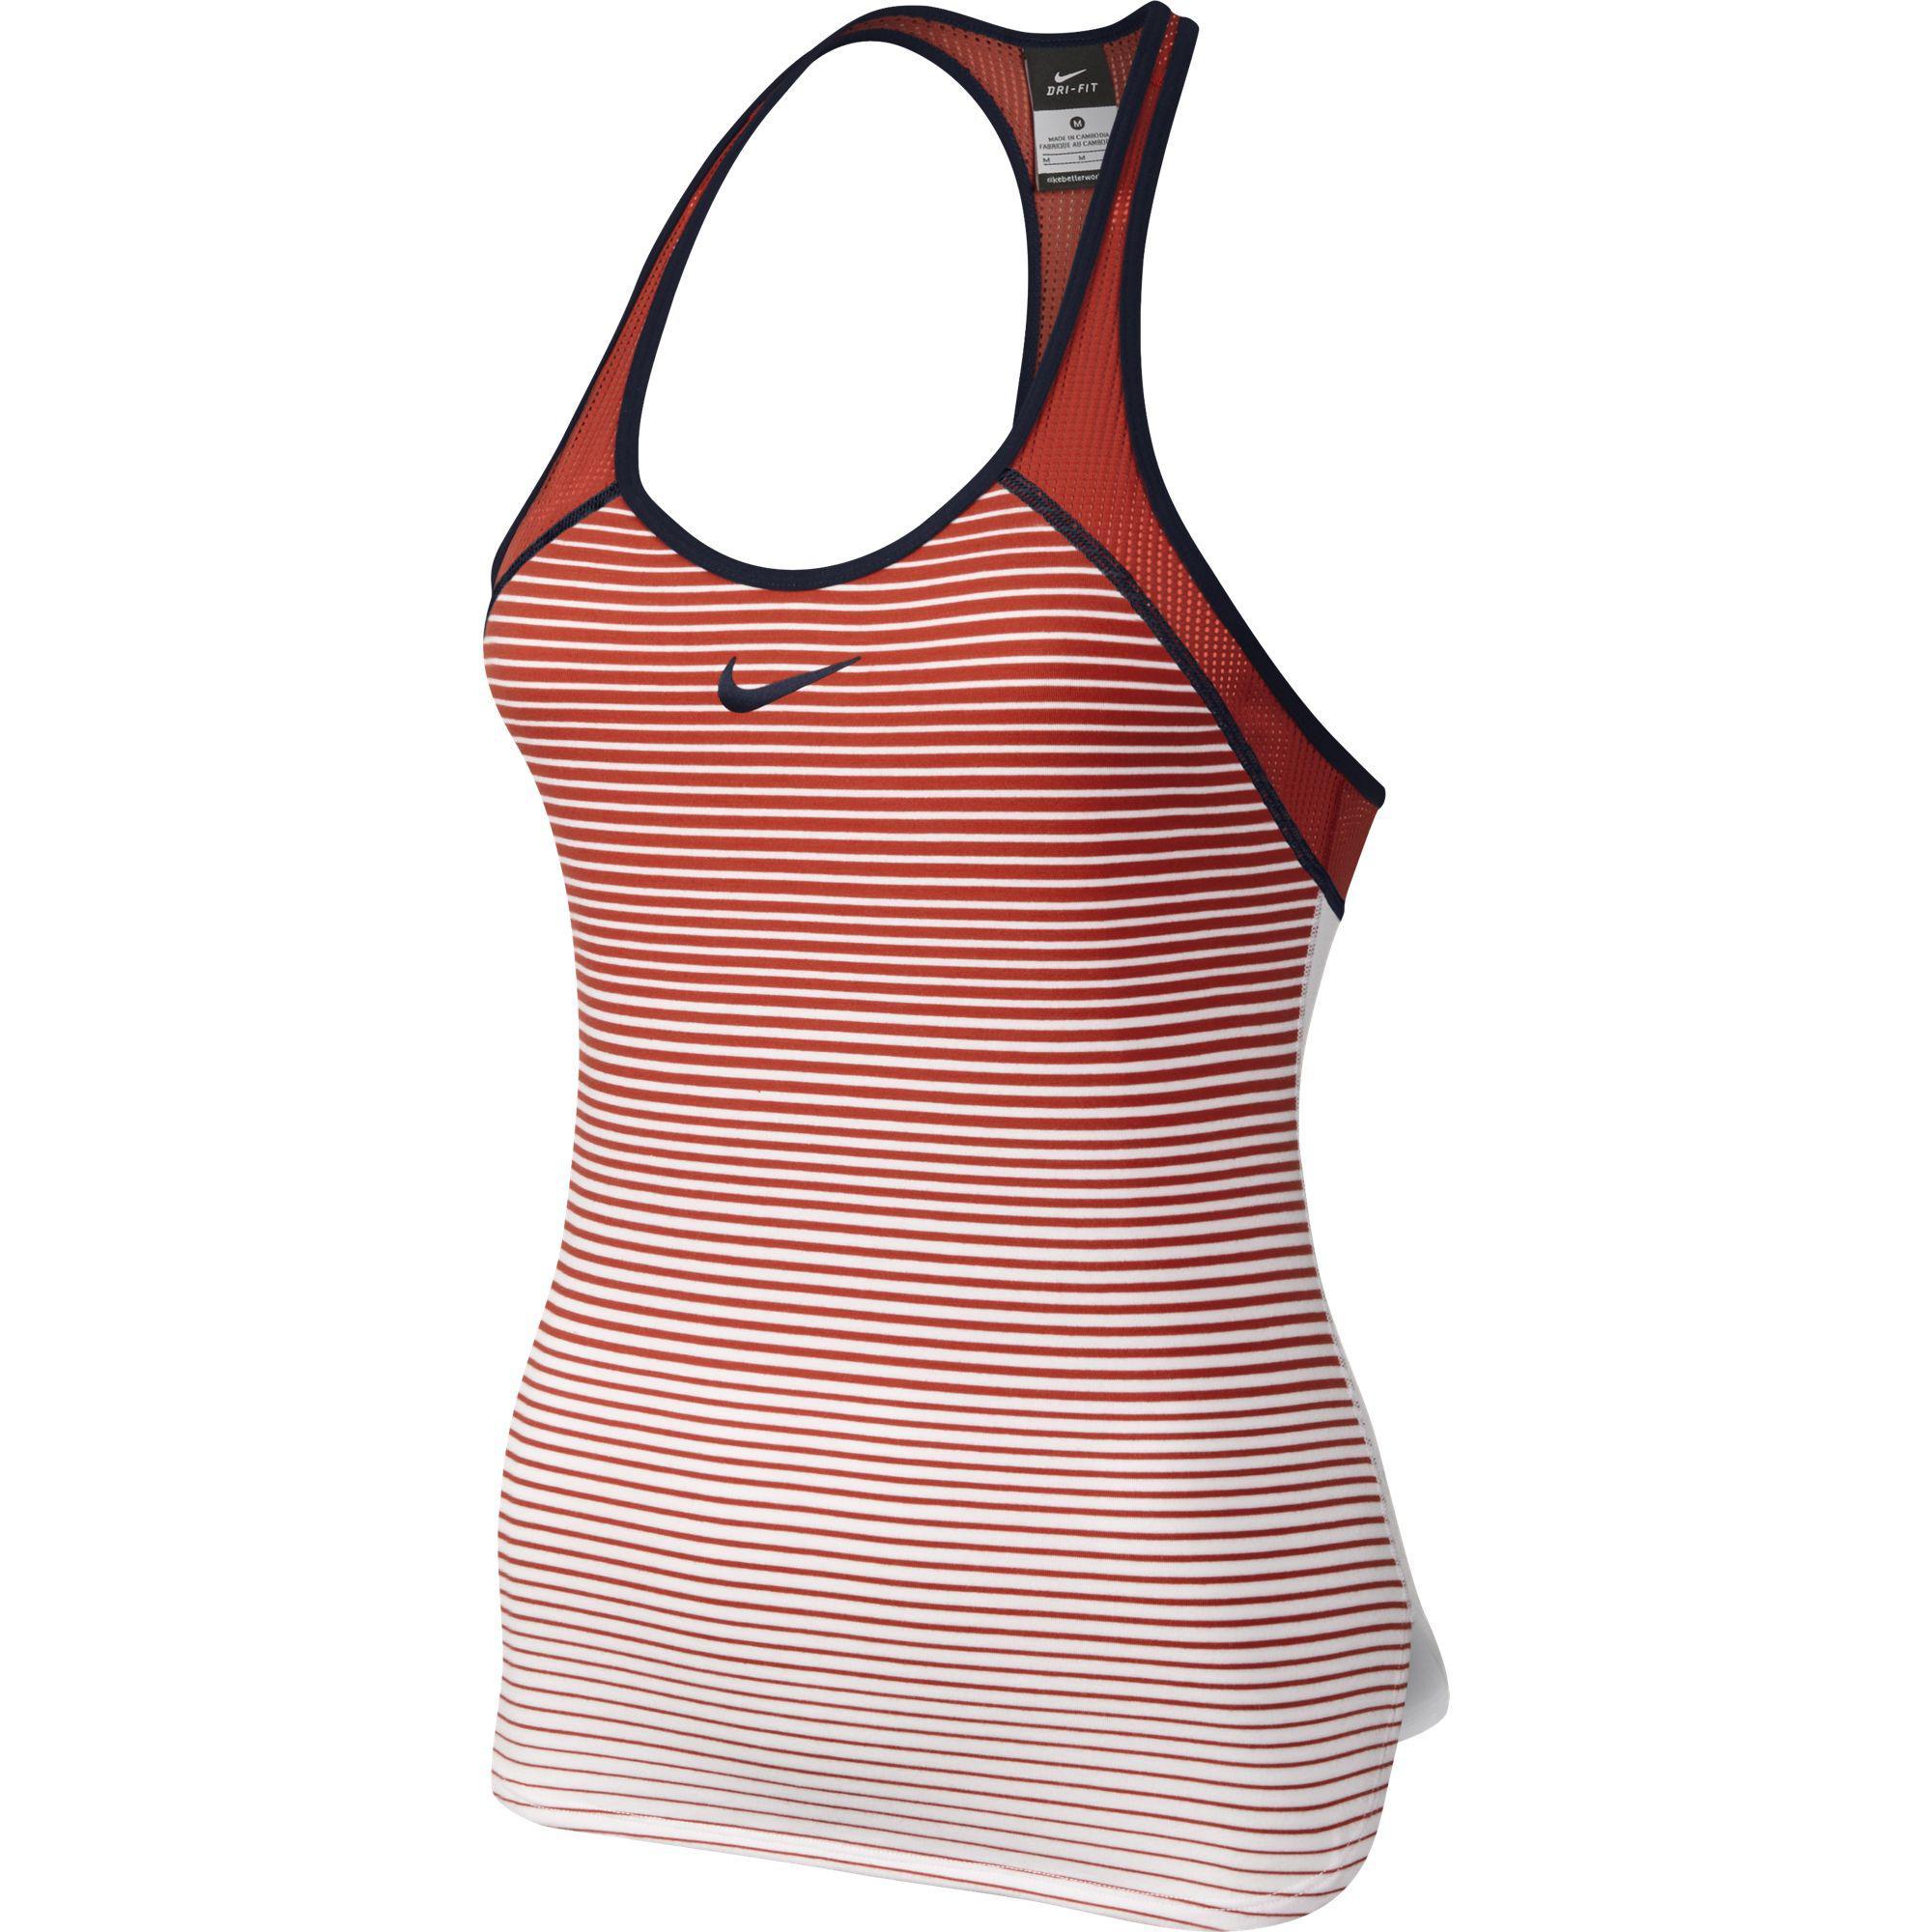 Nike Womens Premier Slam Breathe Tank Top - Light Crimson/Obsidian -  Tennisnuts.com